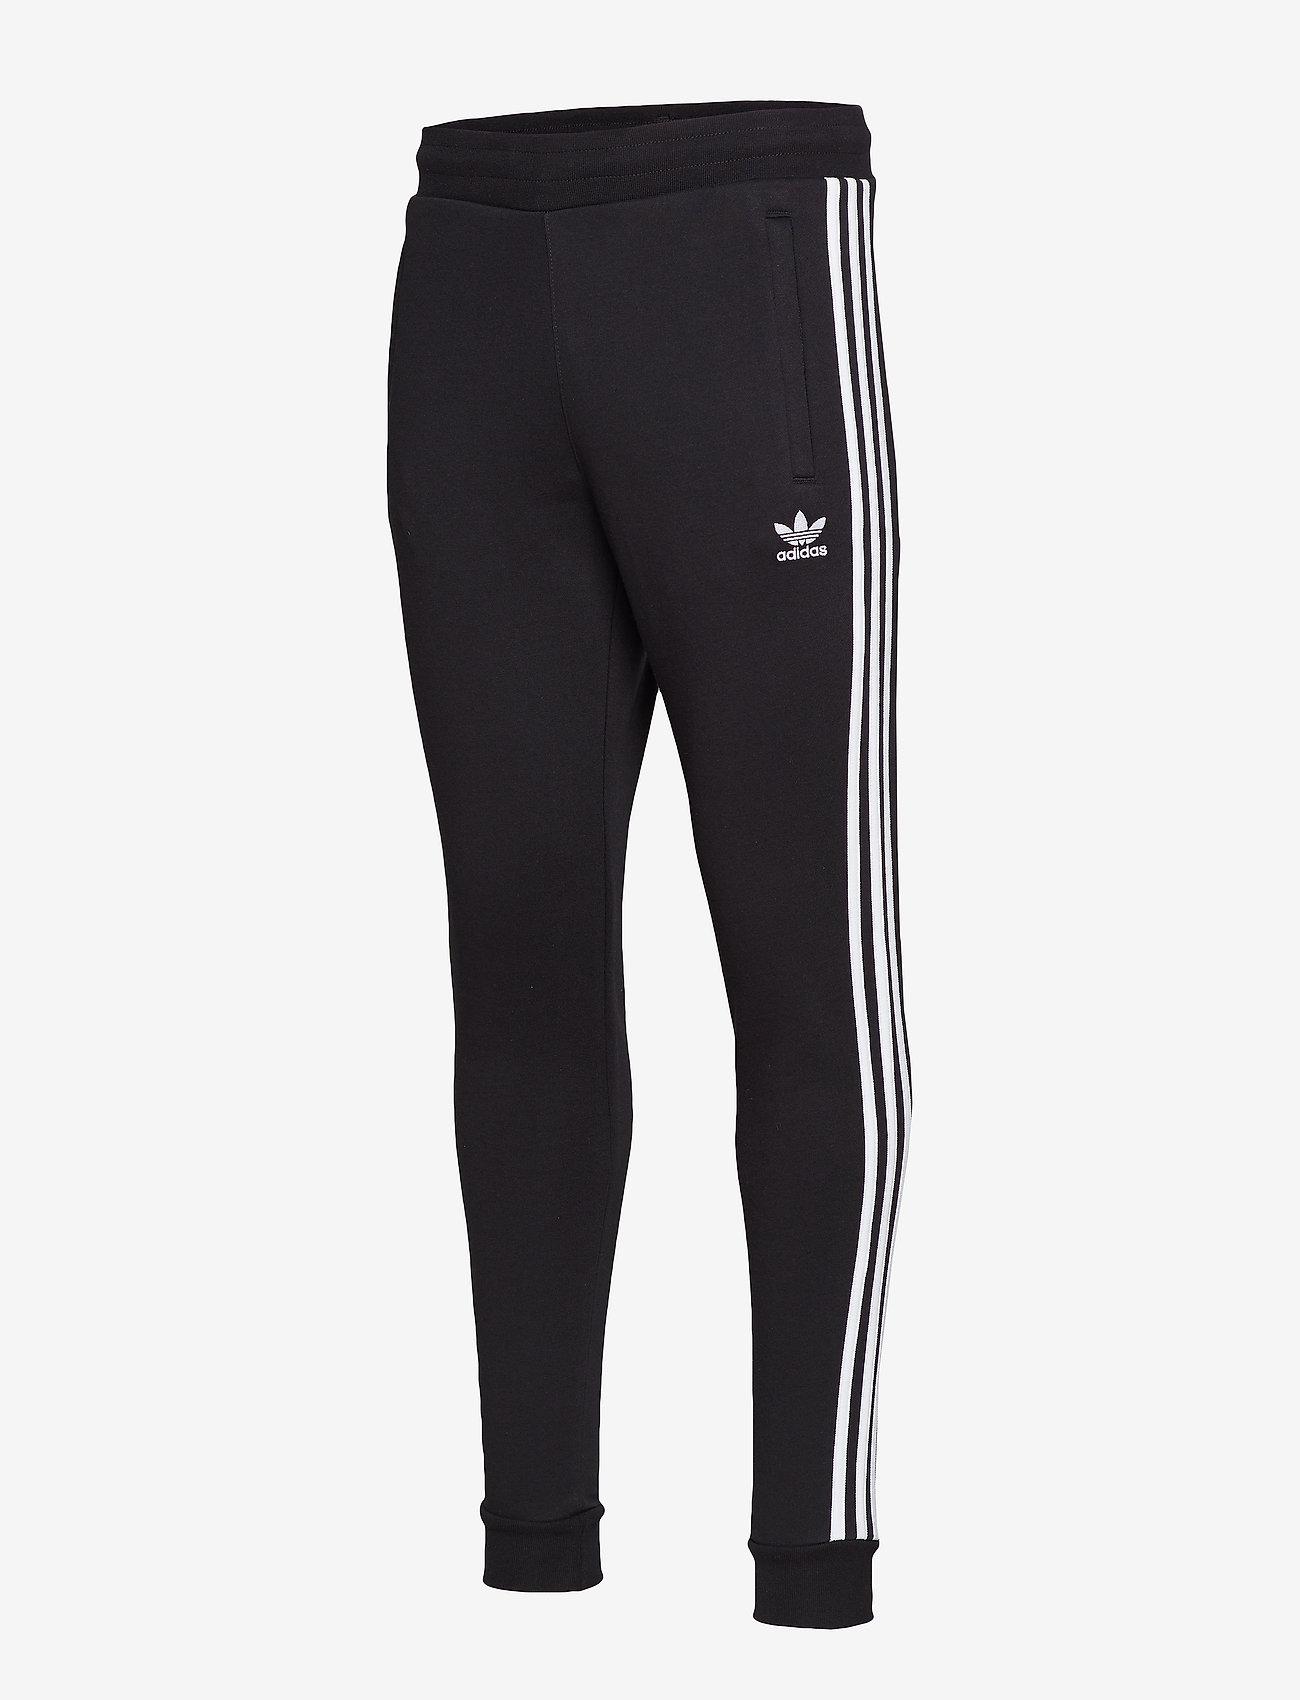 3-stripes Pant (Black) (59.95 €) - adidas Originals Jz5Nc